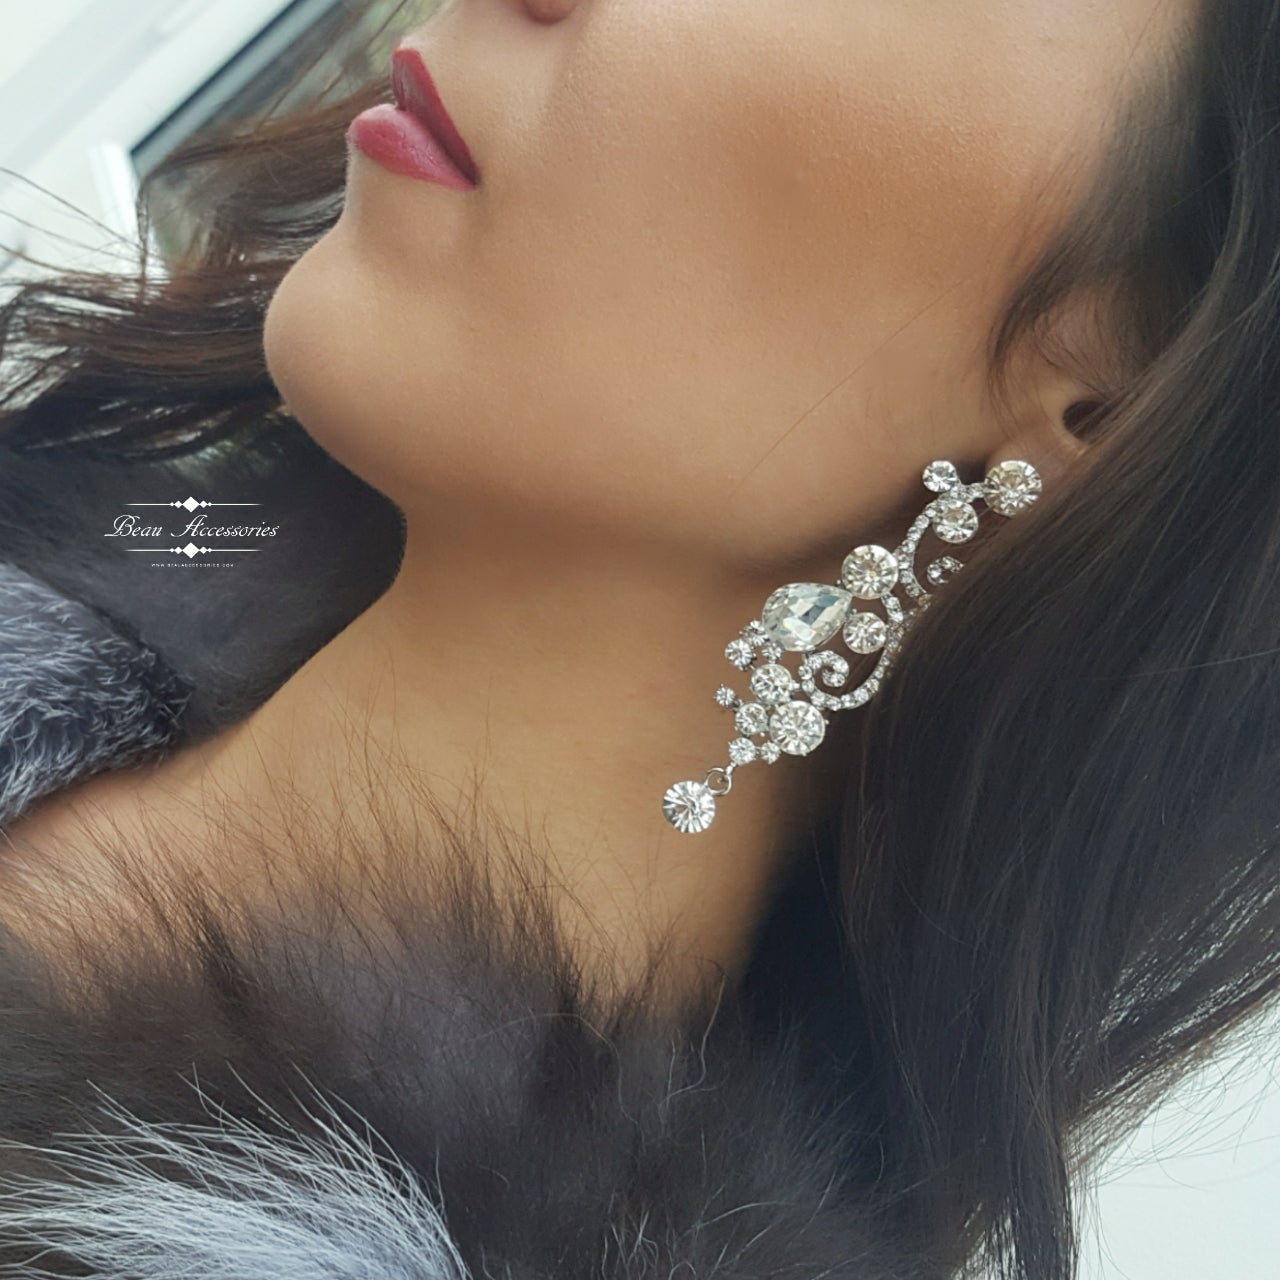 Image of Silver Crystal Droplet Earrings